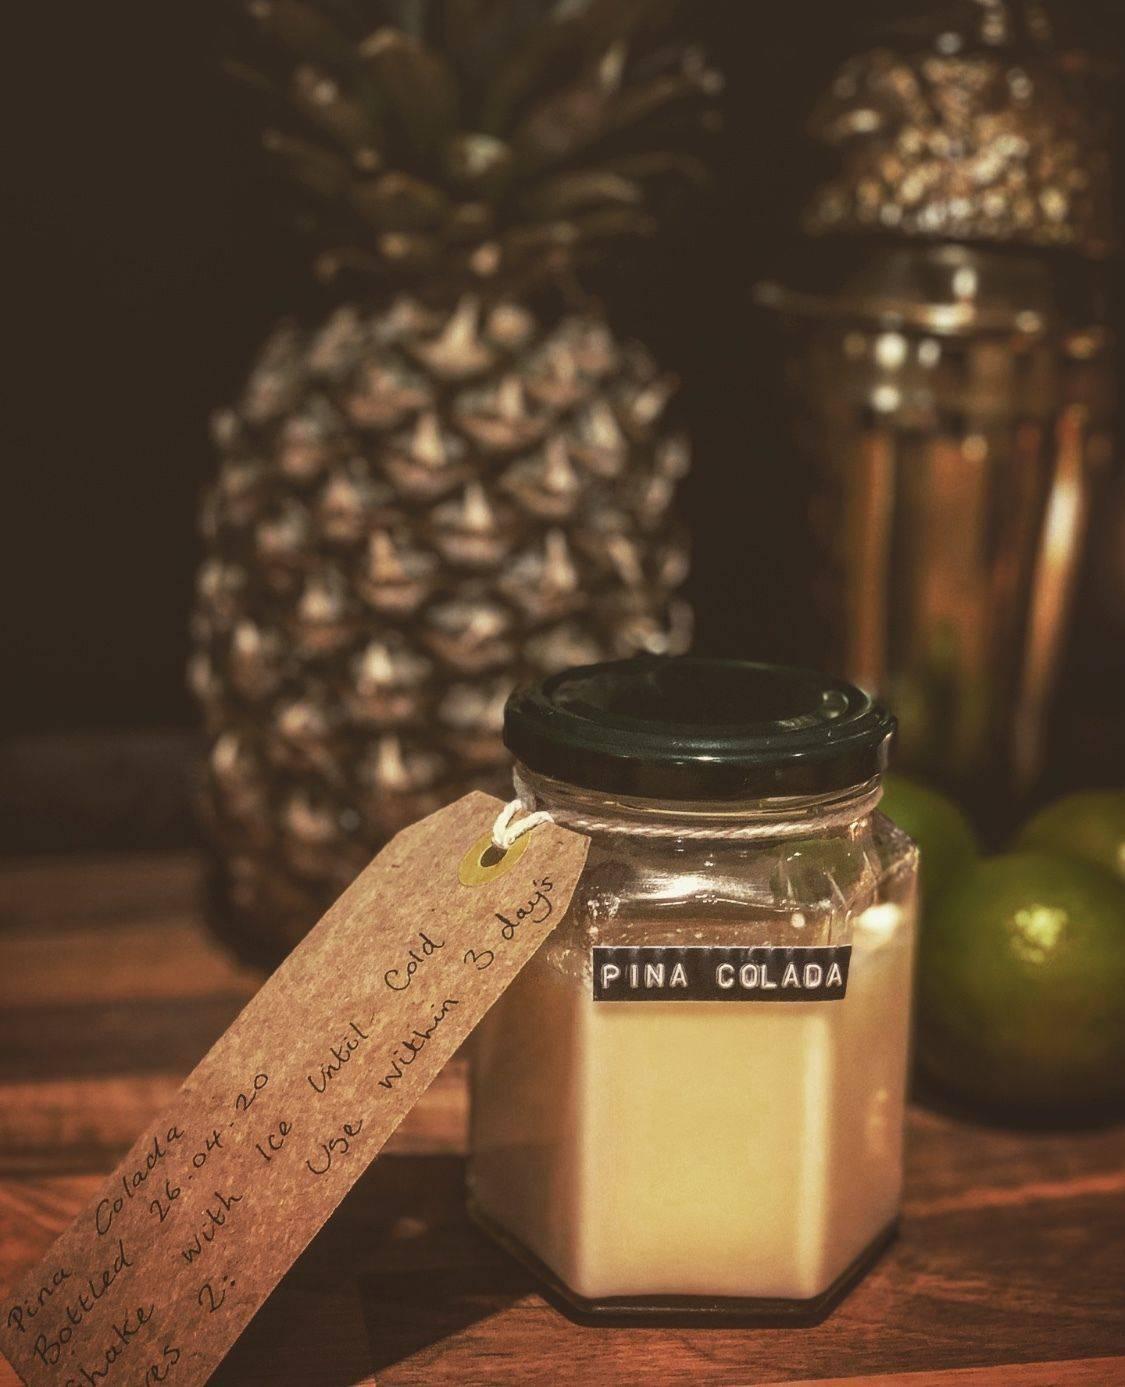 Pina Colada cocktail (serves 2)